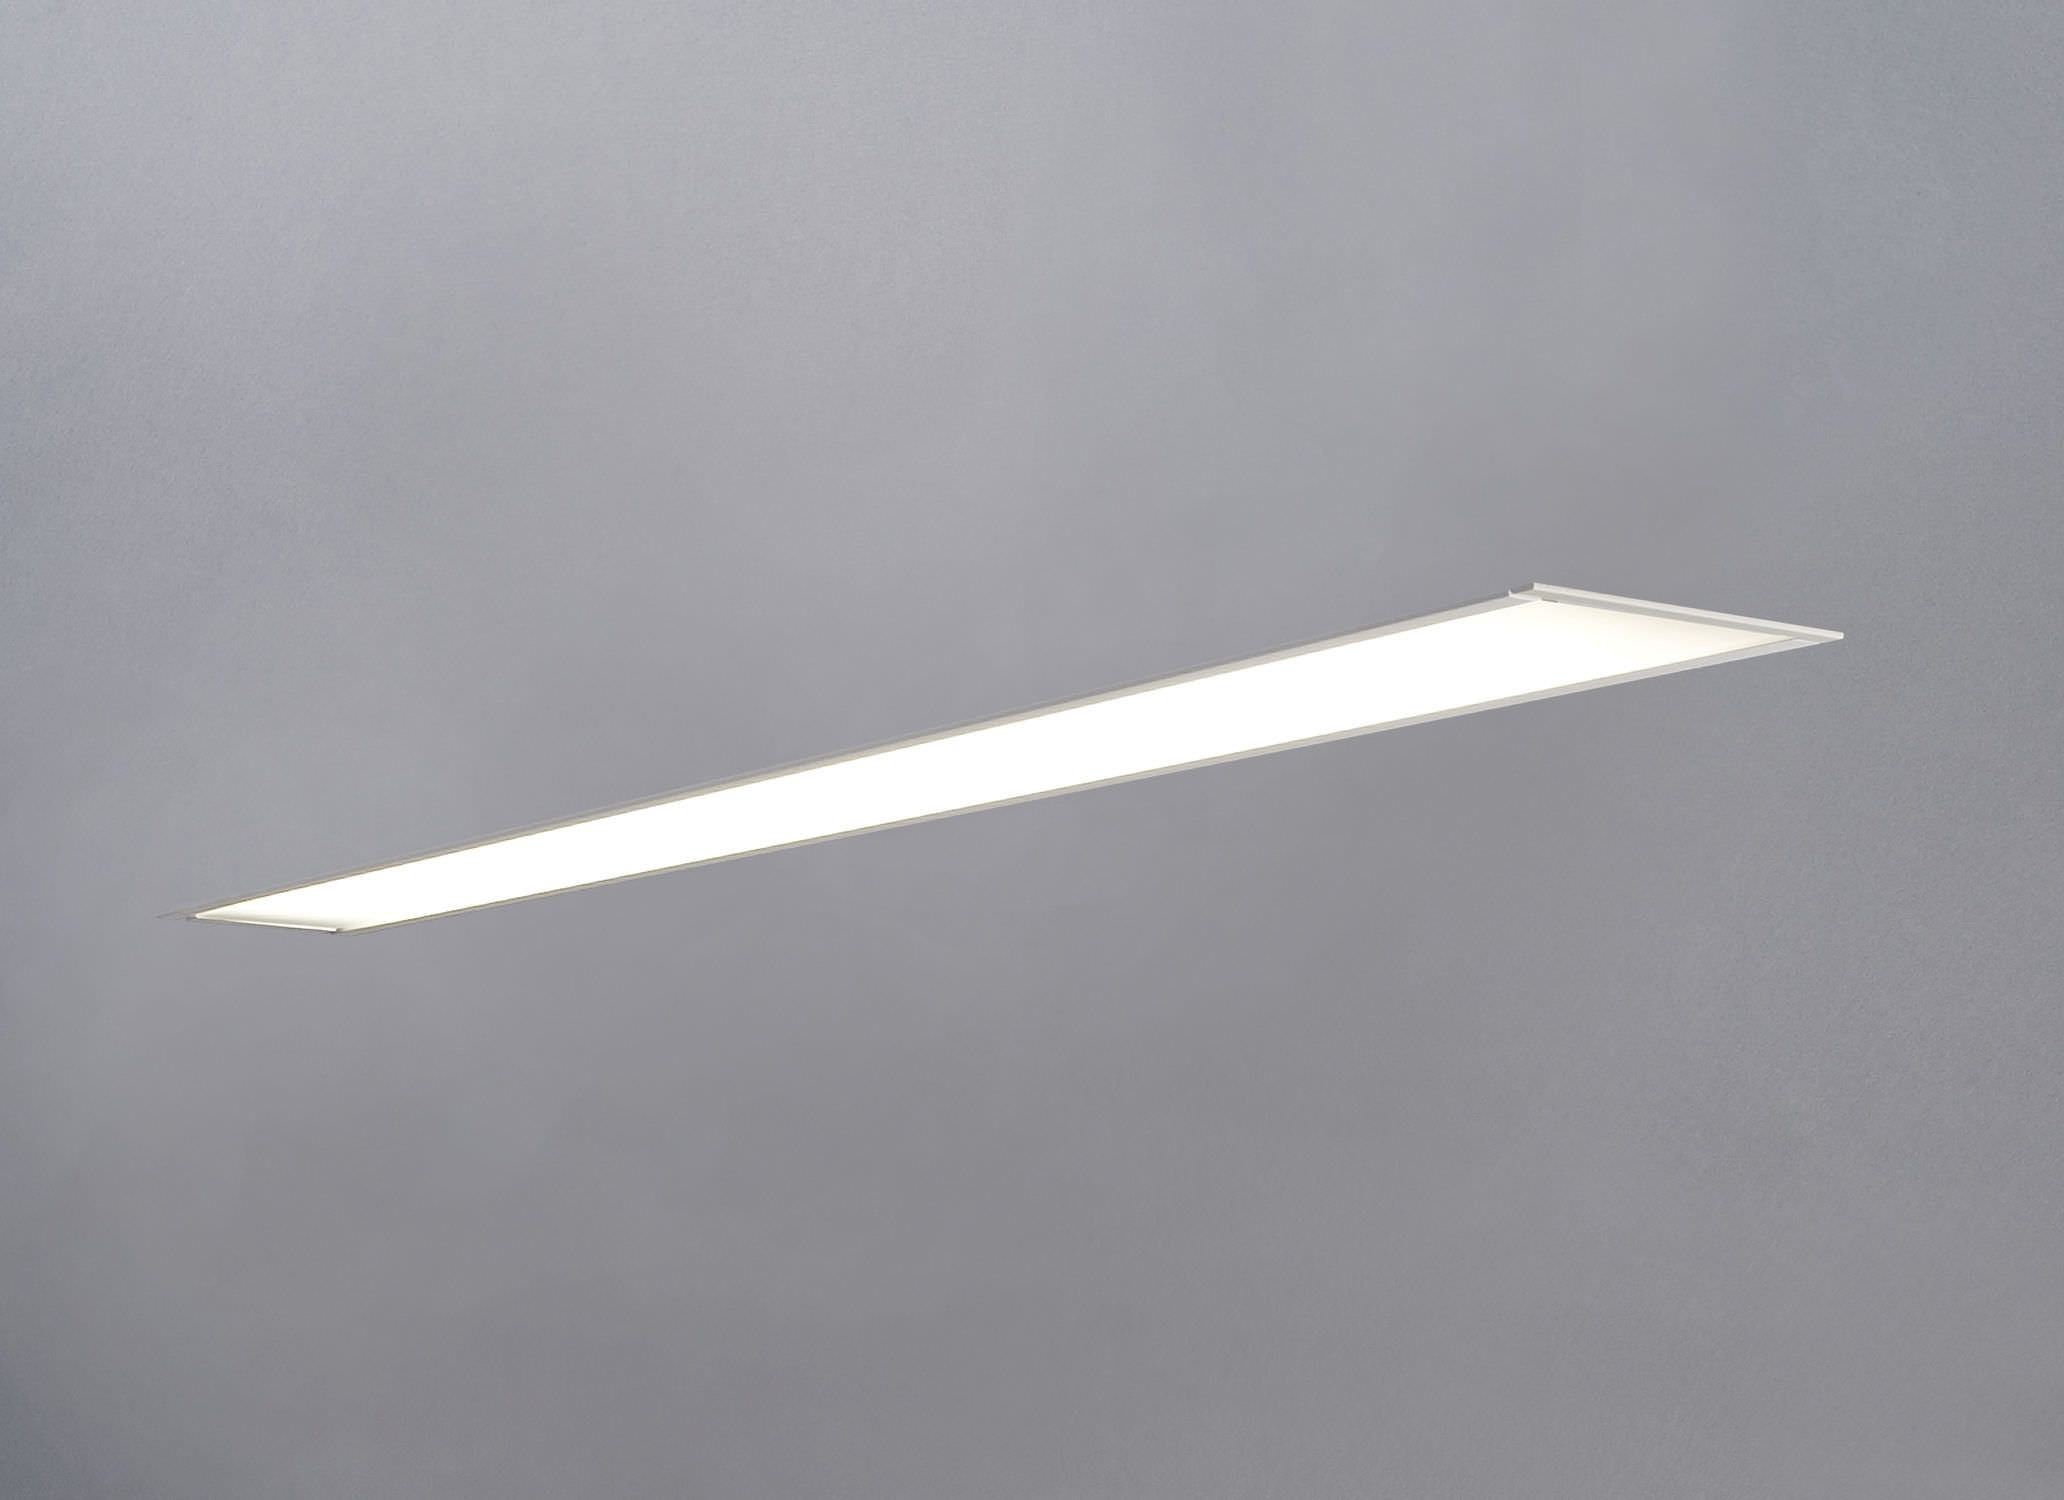 Dimmable Recessed Fluorescent Light Fixtures | http://deai-rank.info ...